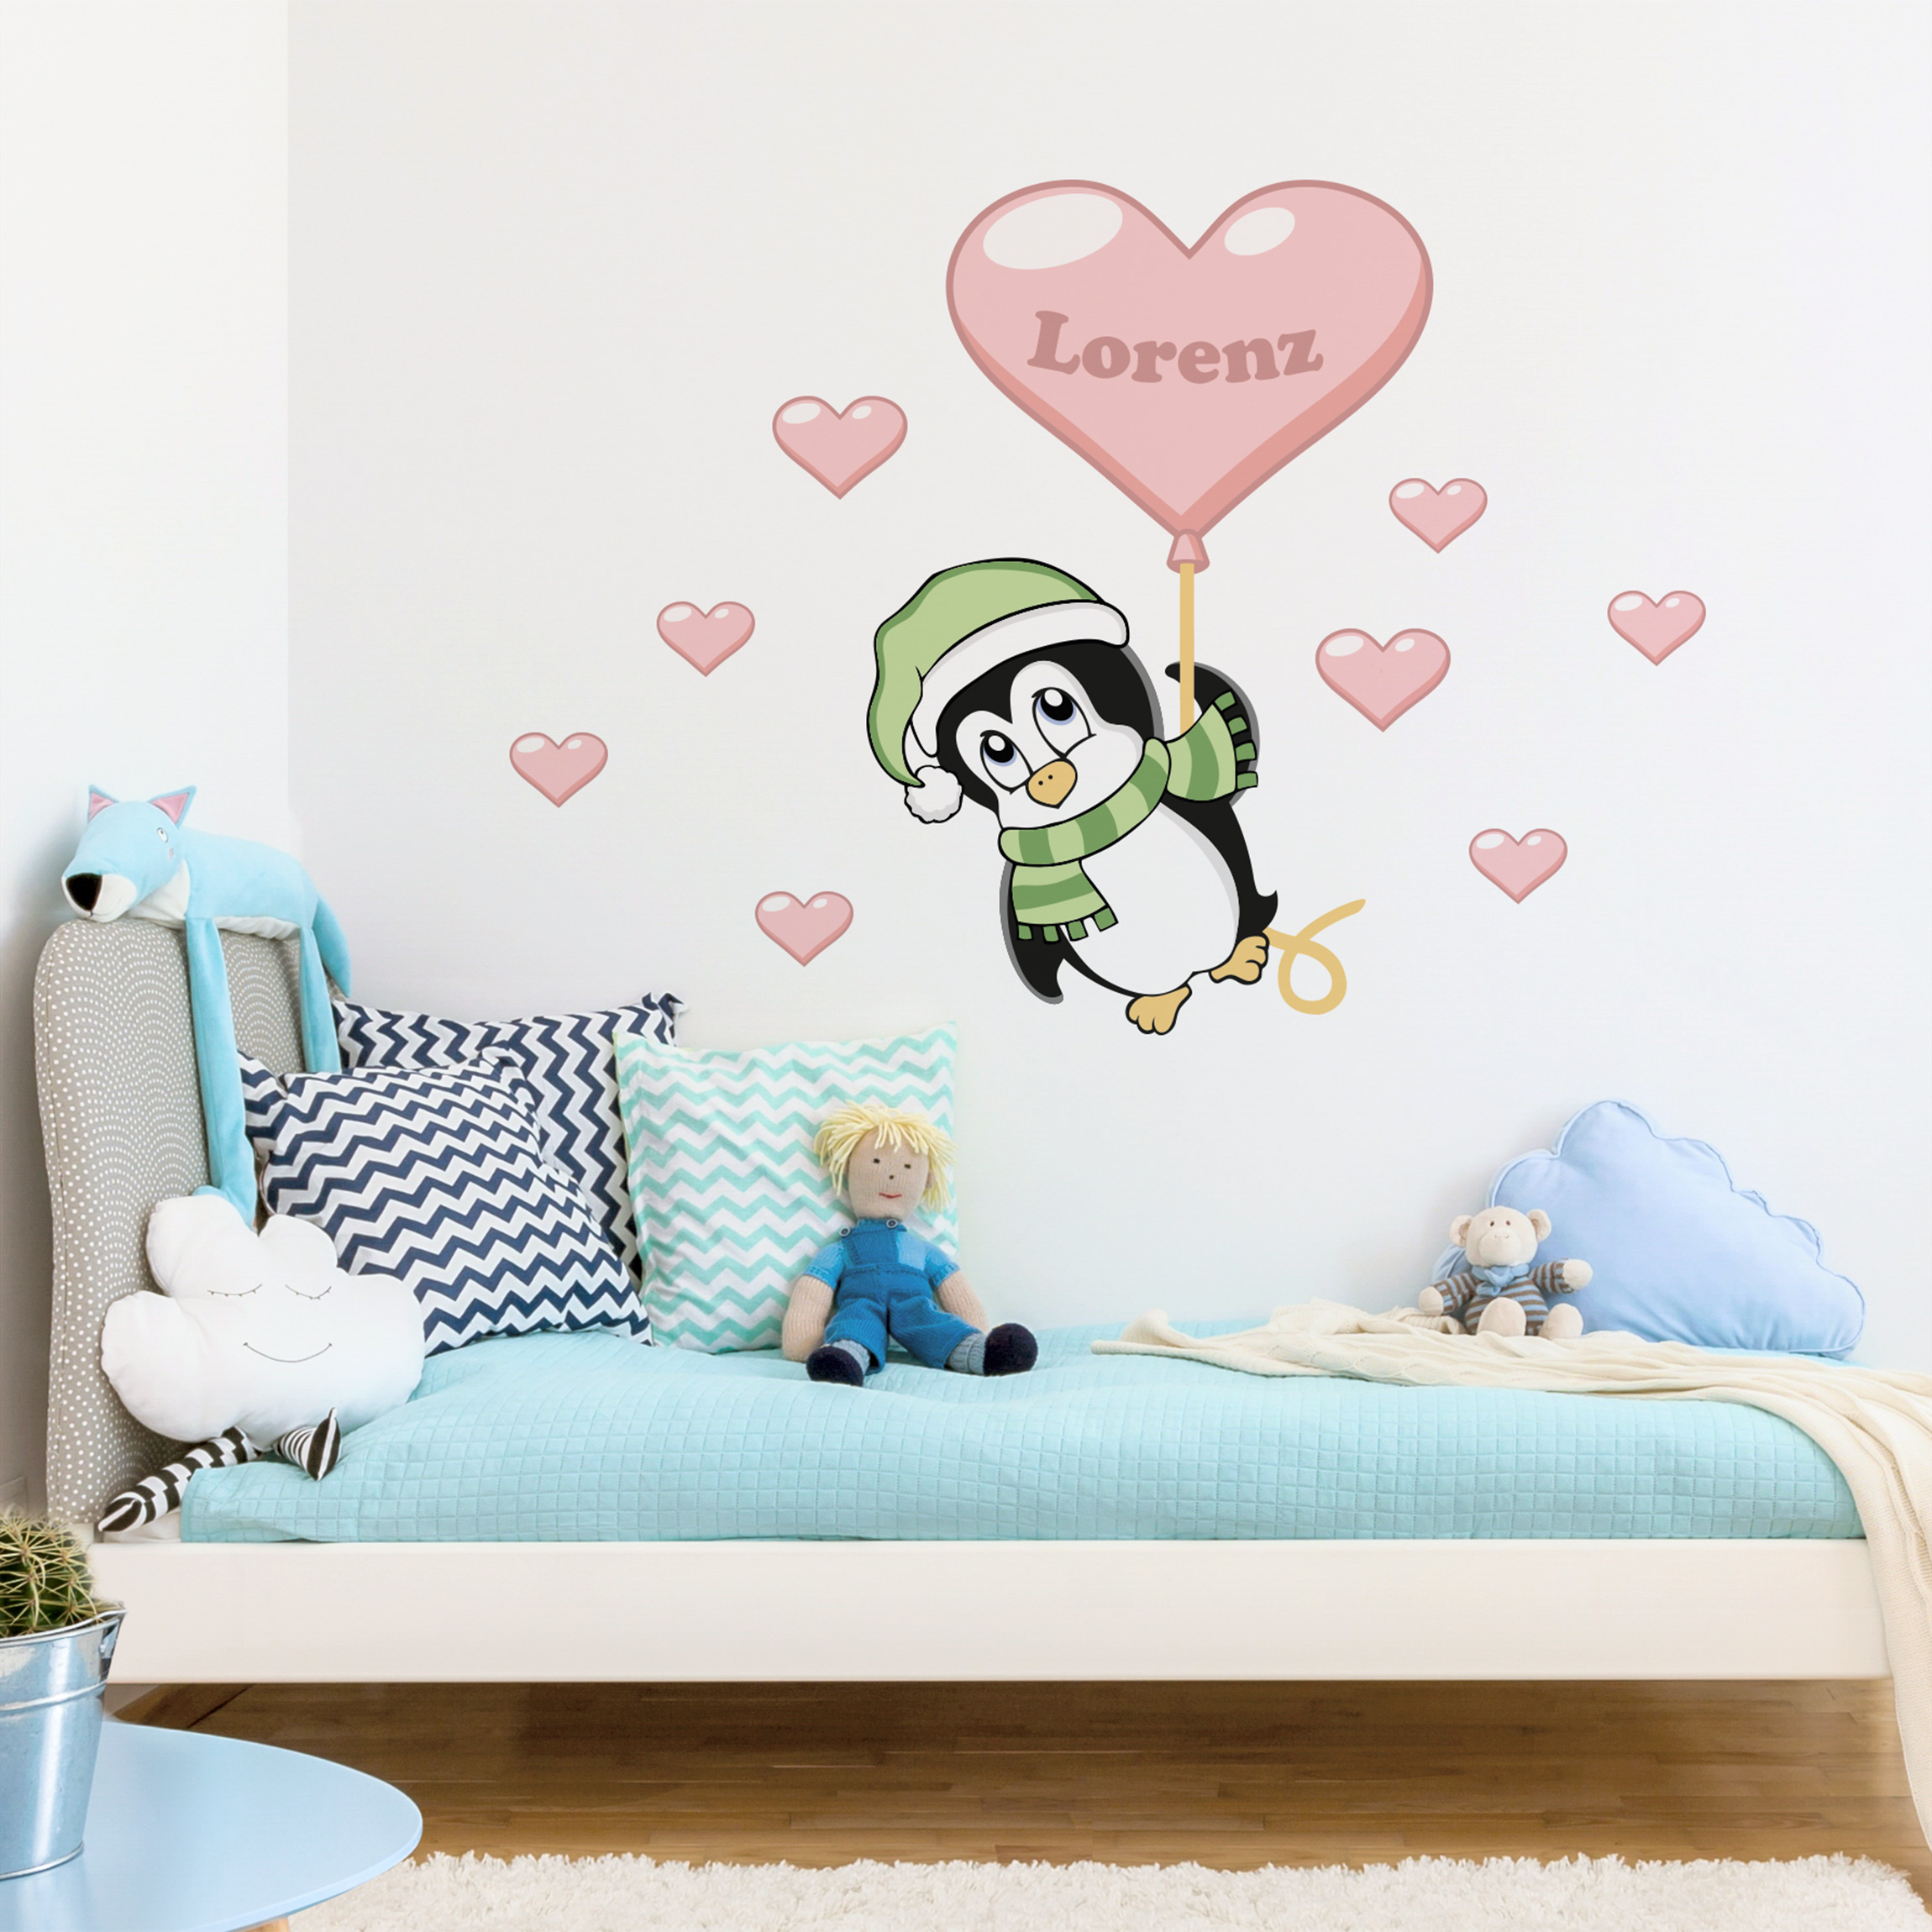 Kinderzimmer wandtattoo mit wunschtext pinguin junge mit - Kinderzimmer wandtattoo junge ...